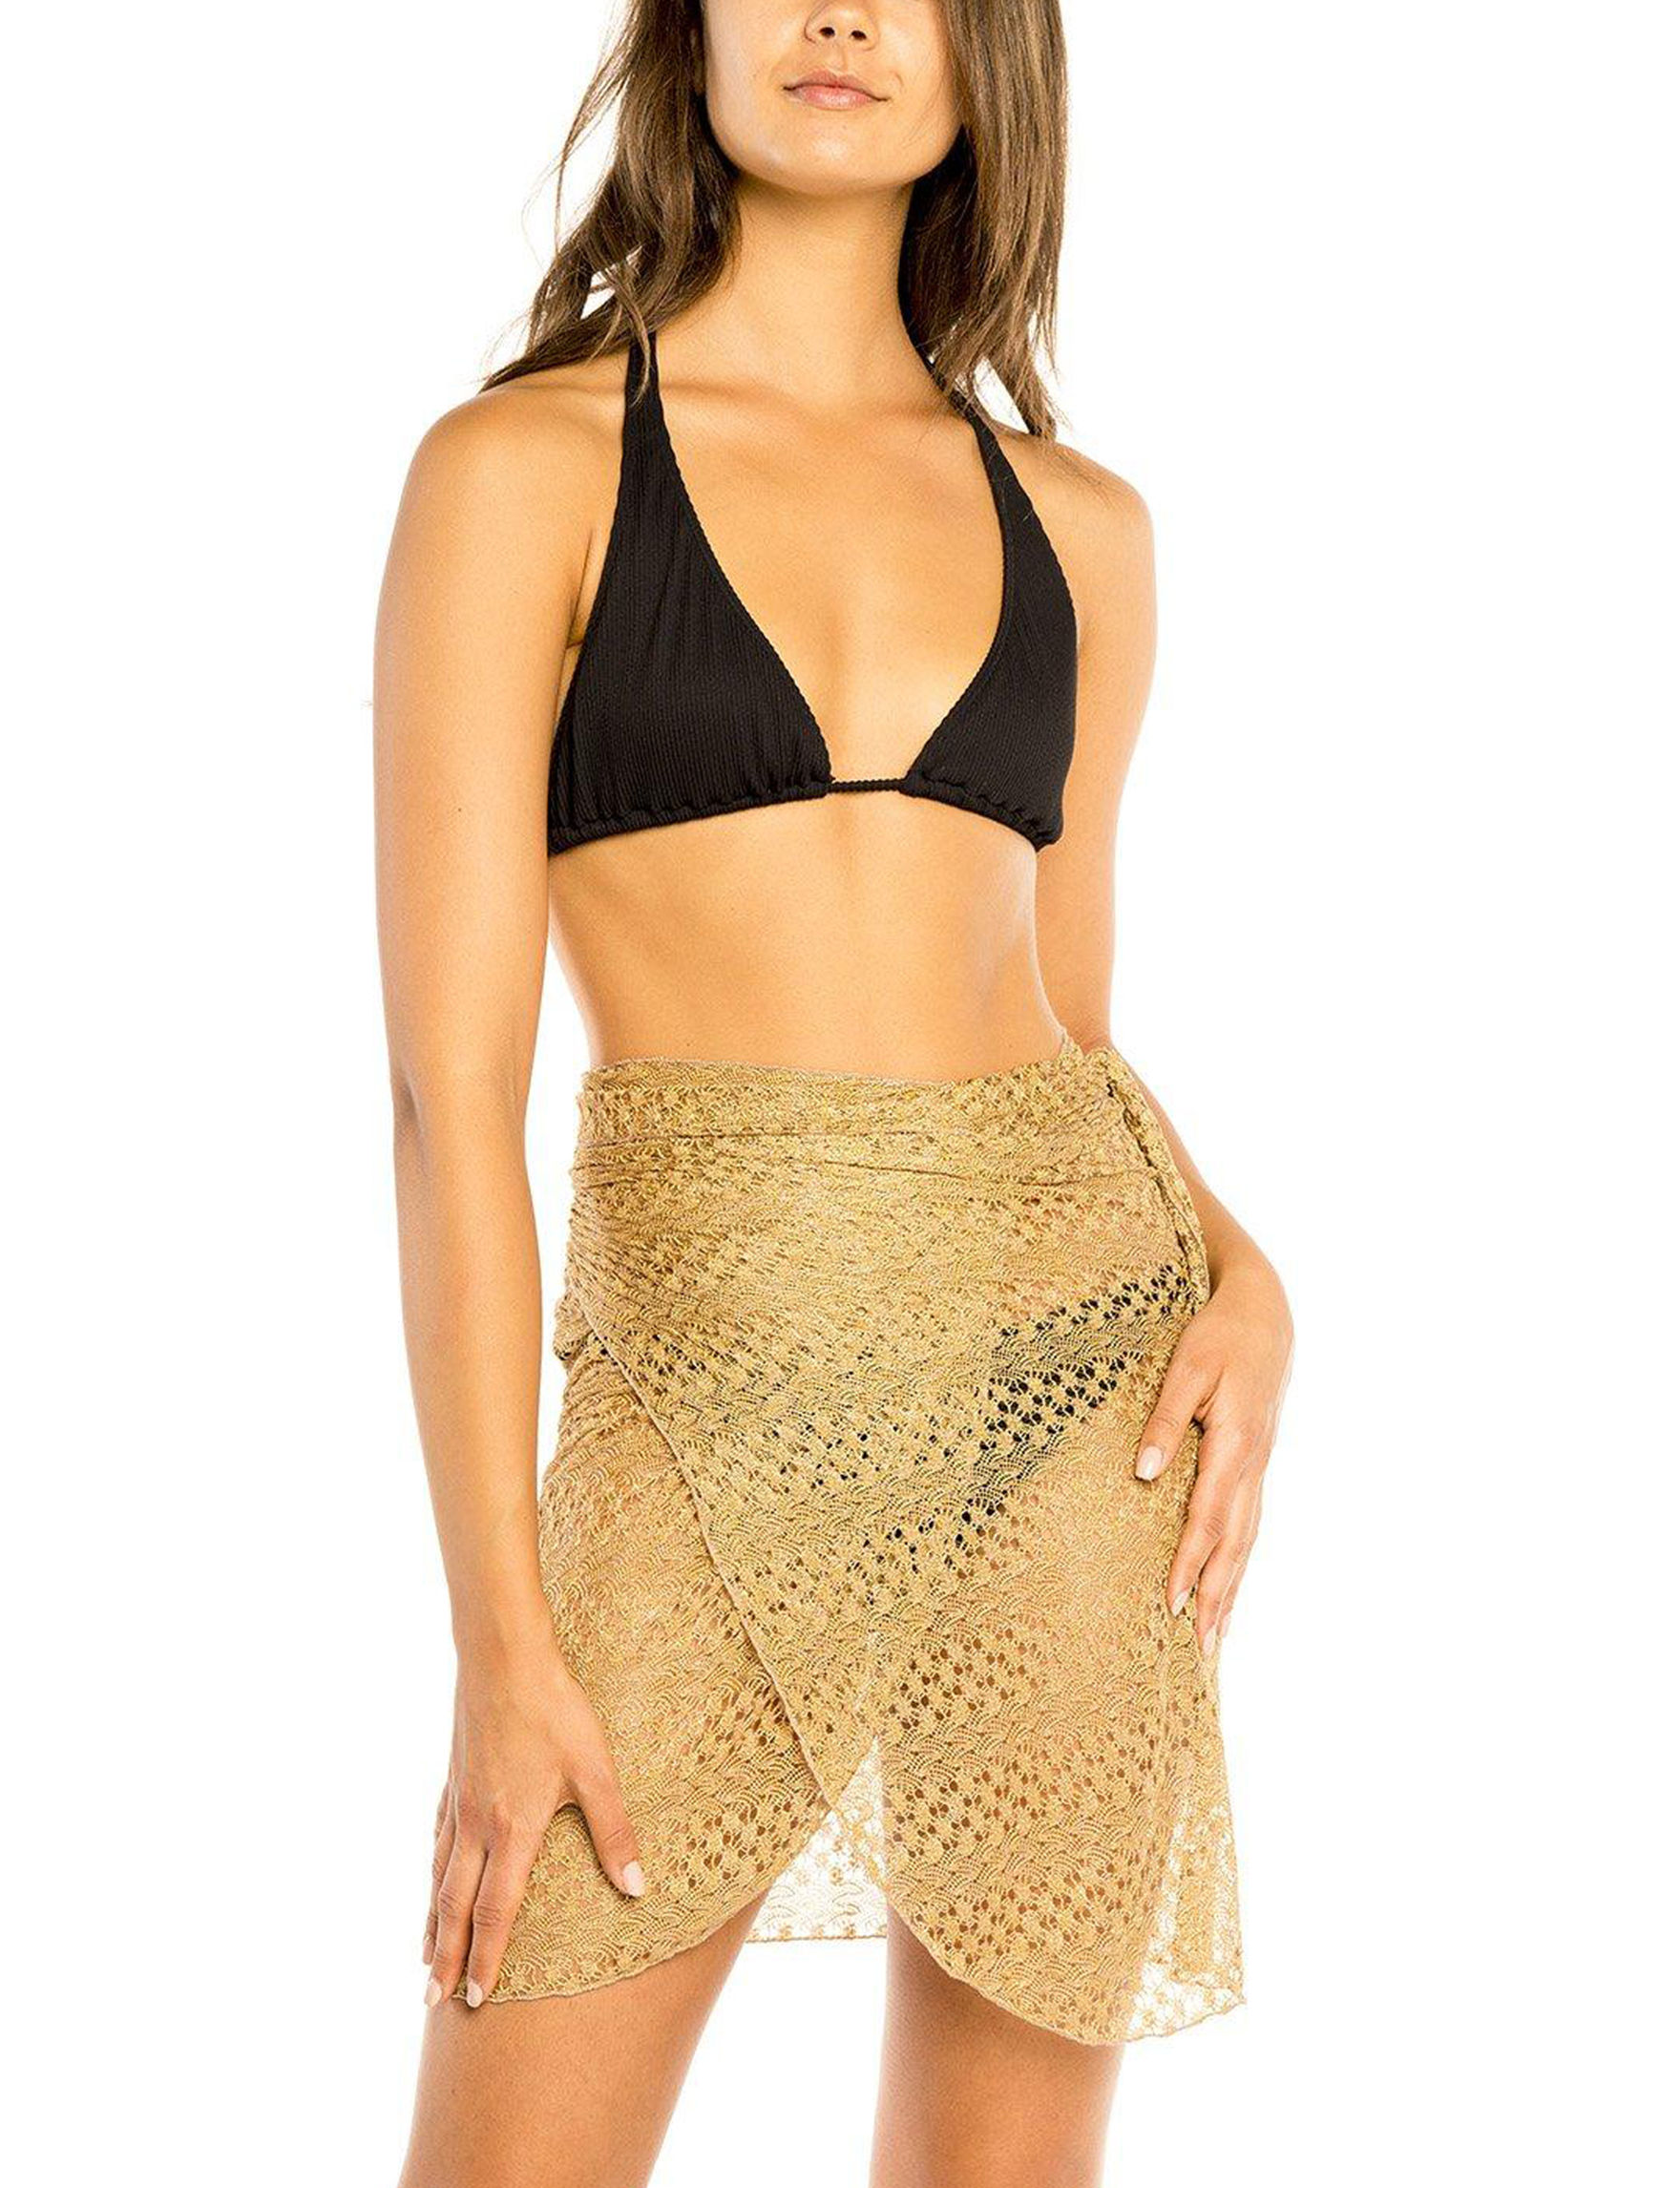 781d52453bd3 Jordan Taylor Beachwear Pareo Swim Cover-up Skirt